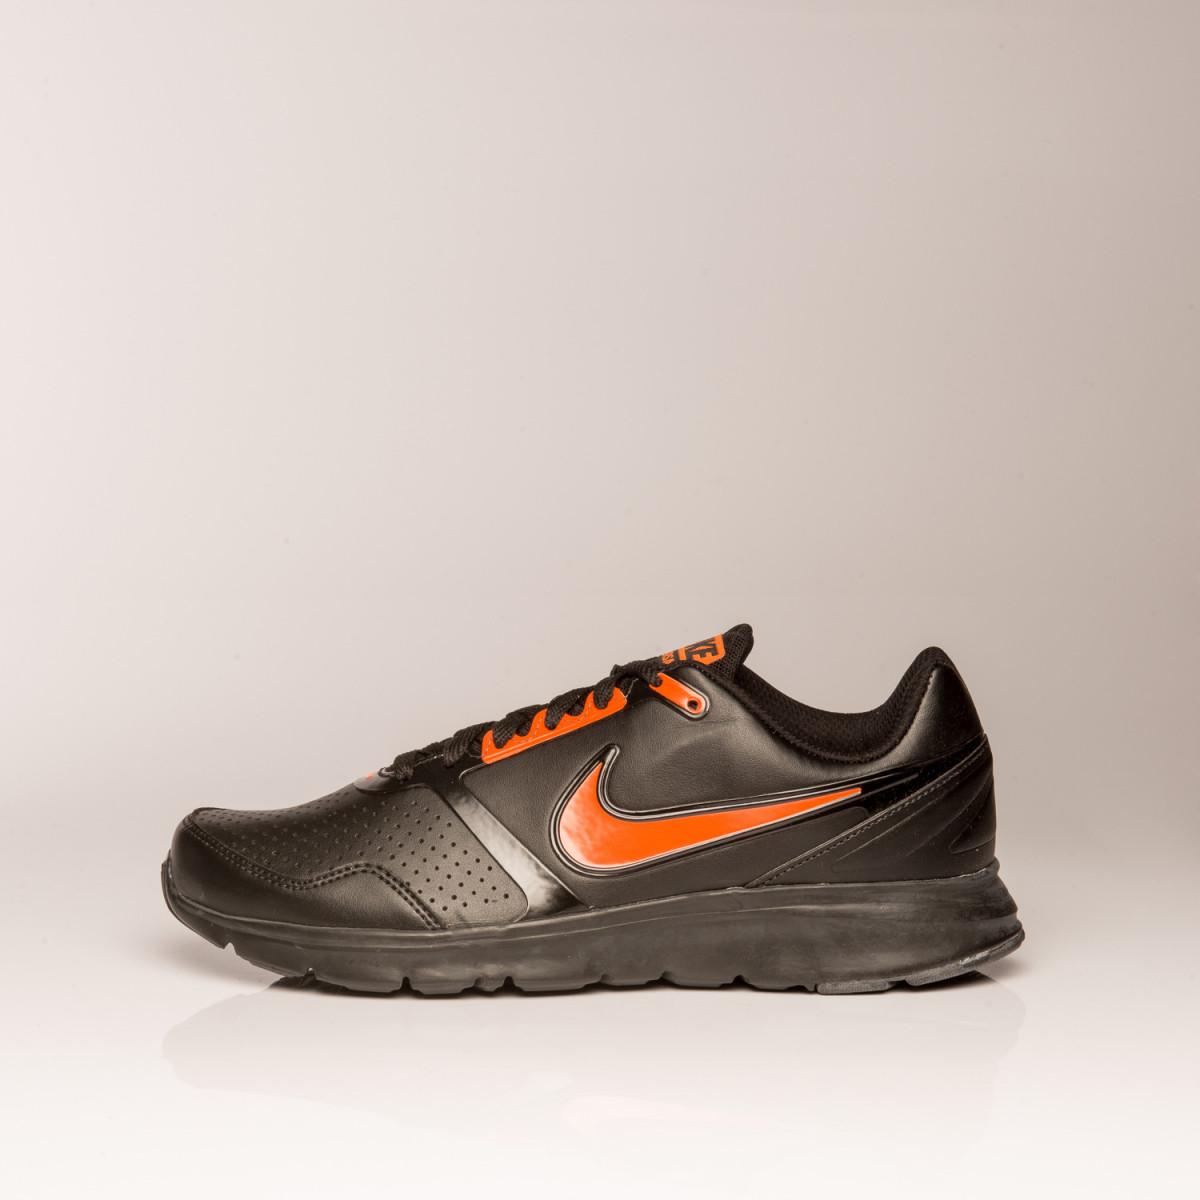 Zapatillas Nike Versa Sl